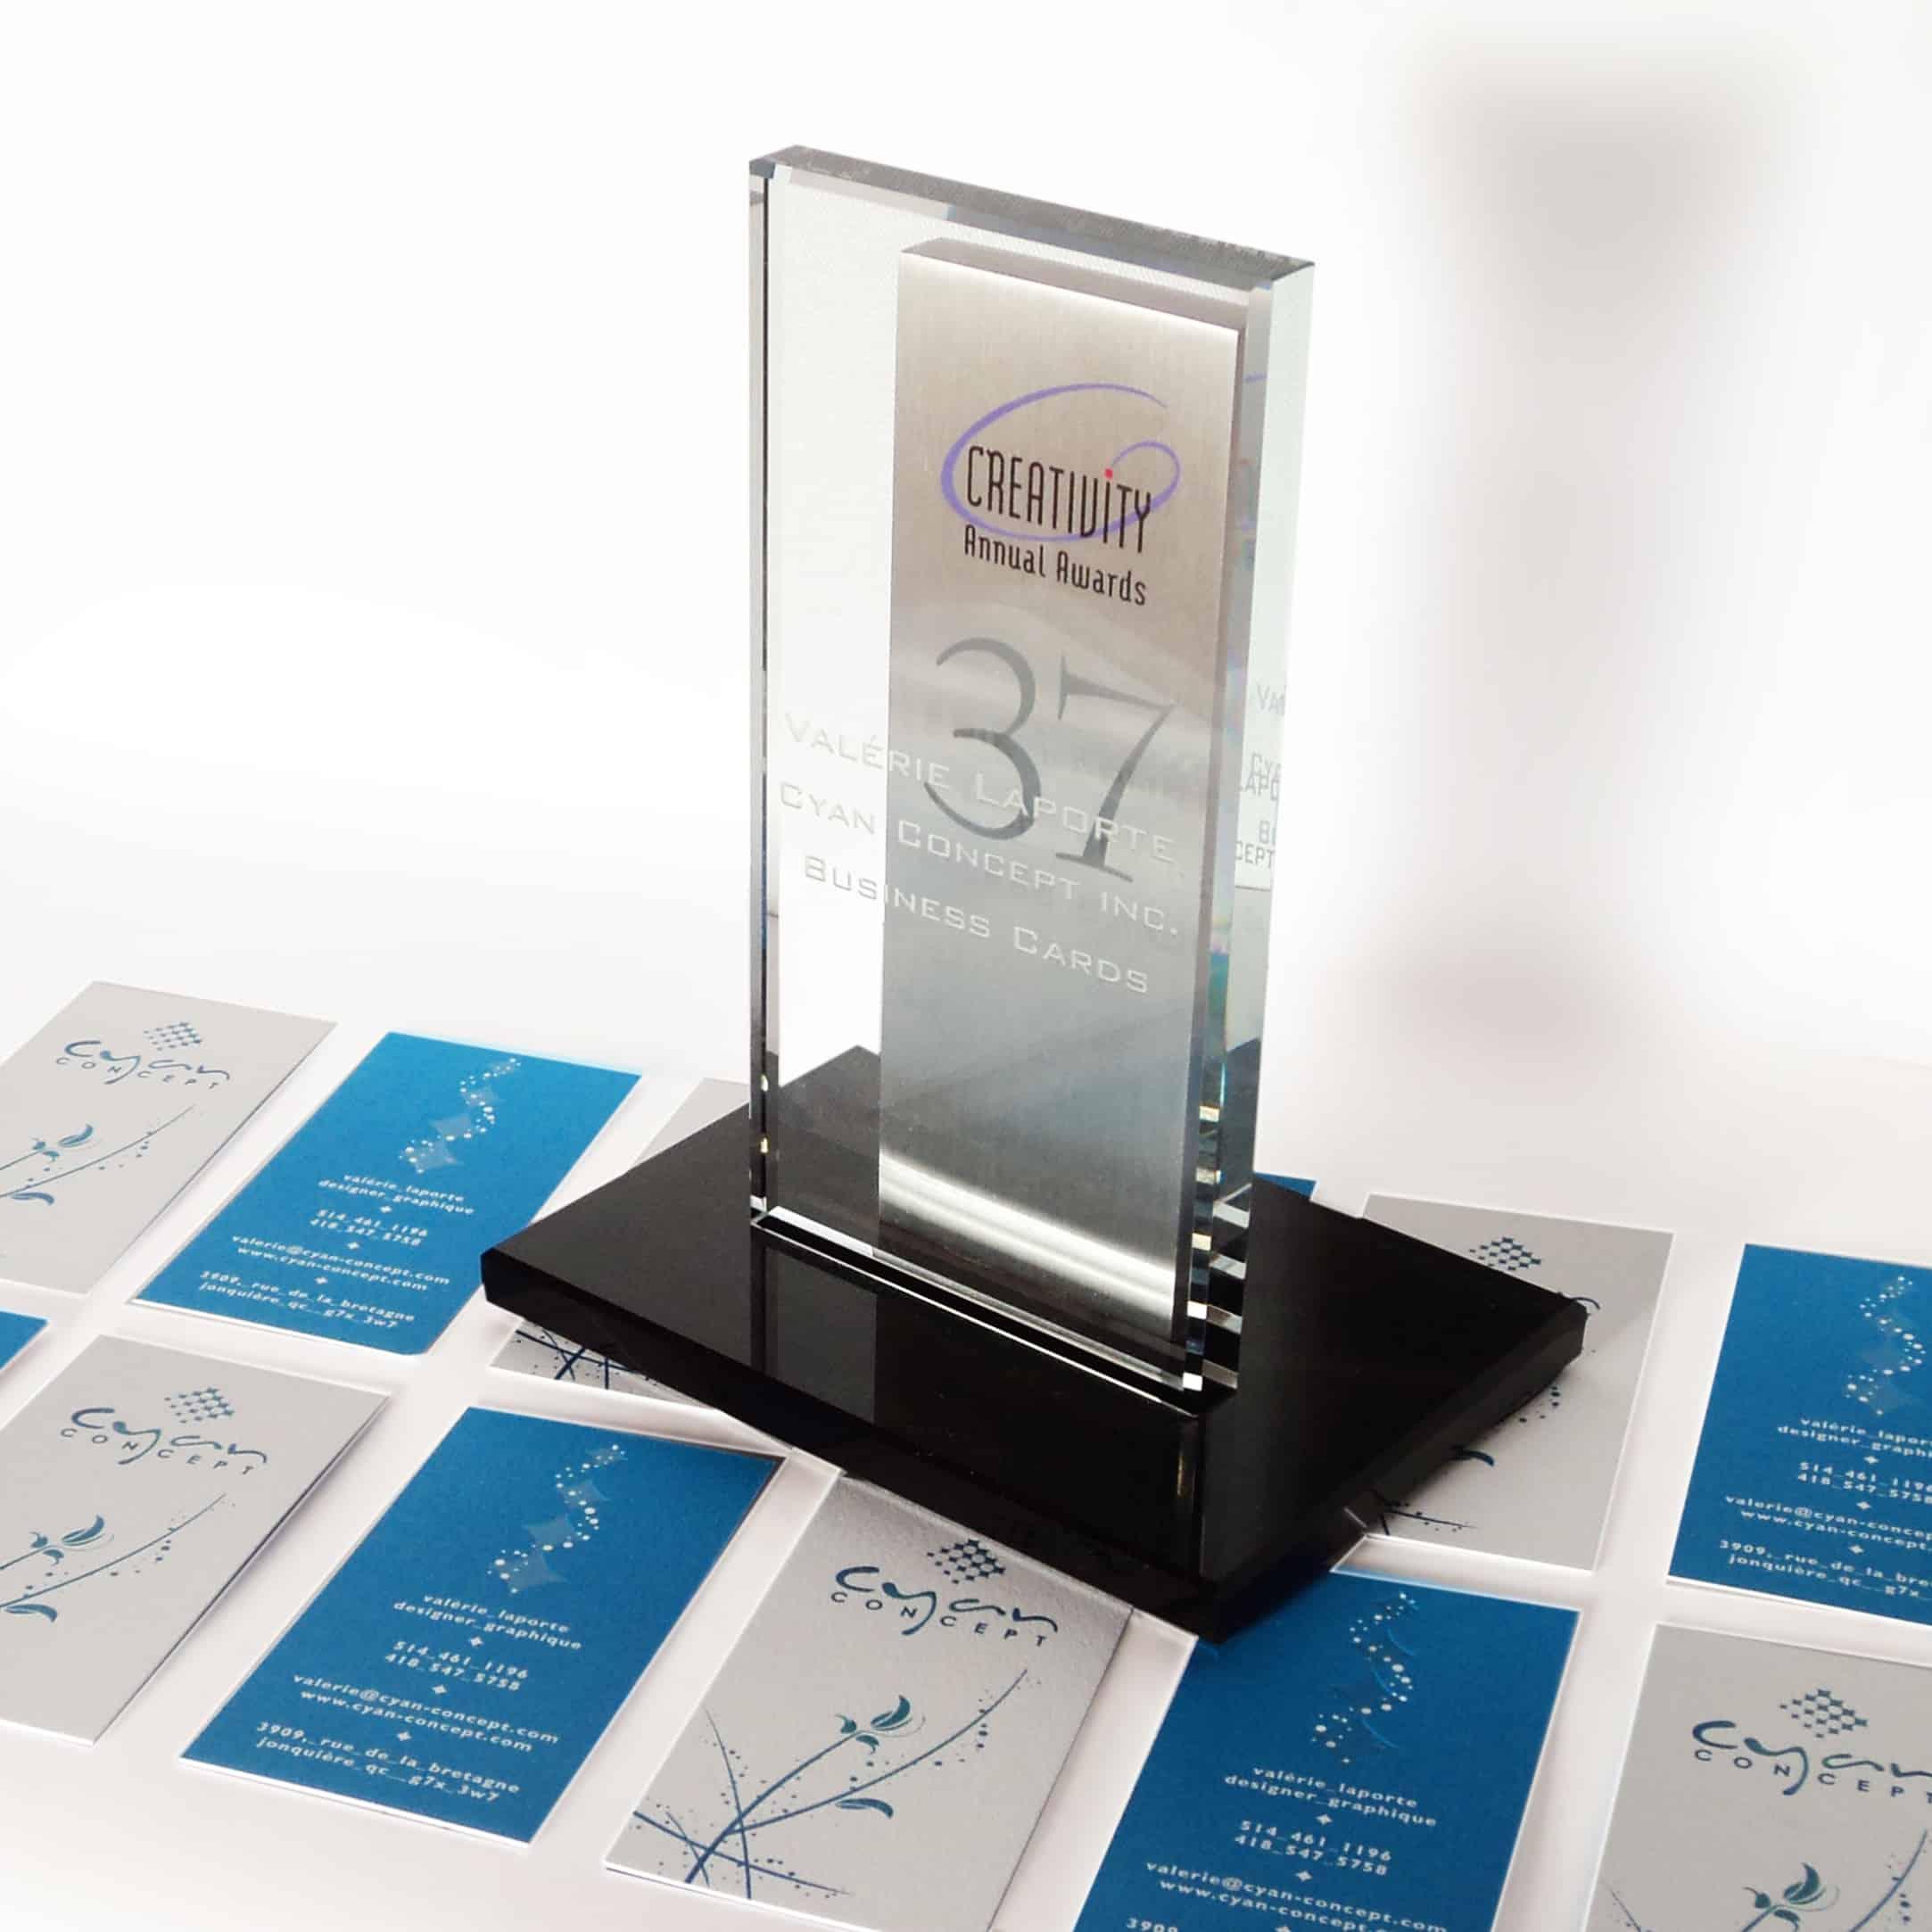 Creativity Awards Cyan Concept